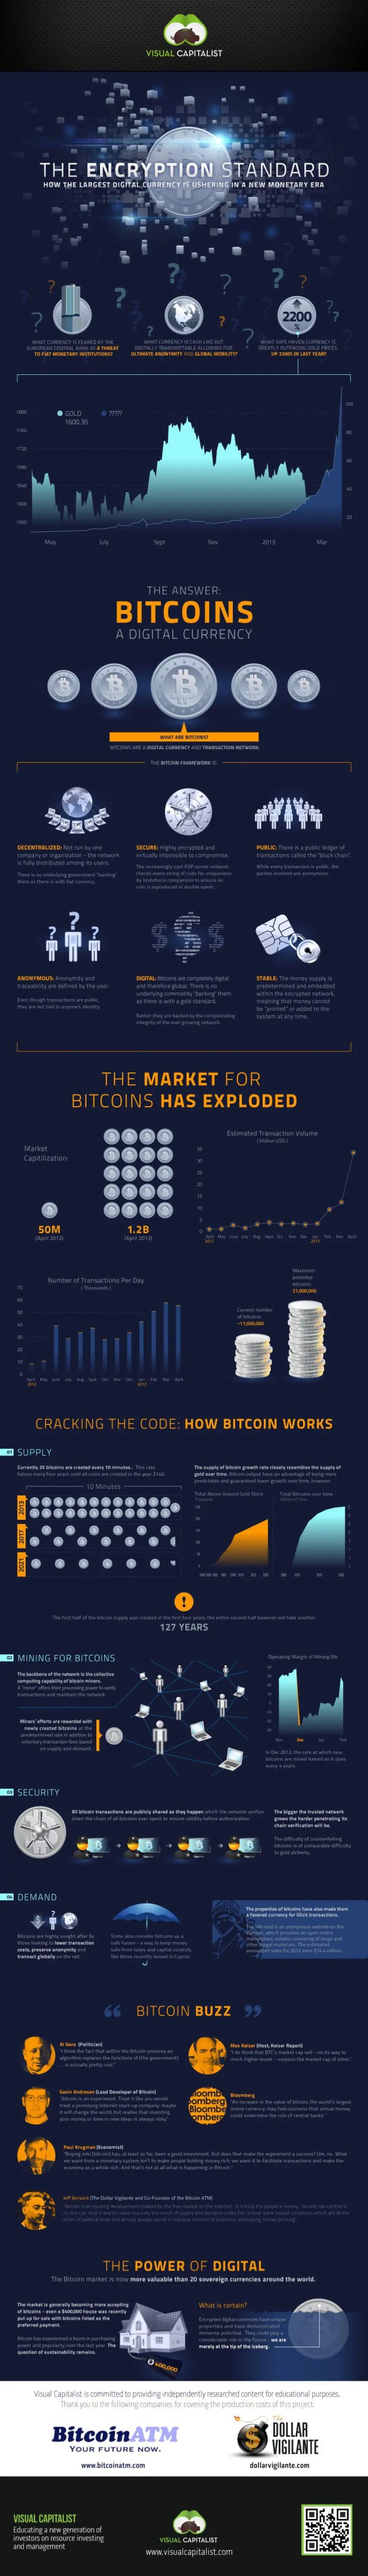 bitcoin-encryption-standard